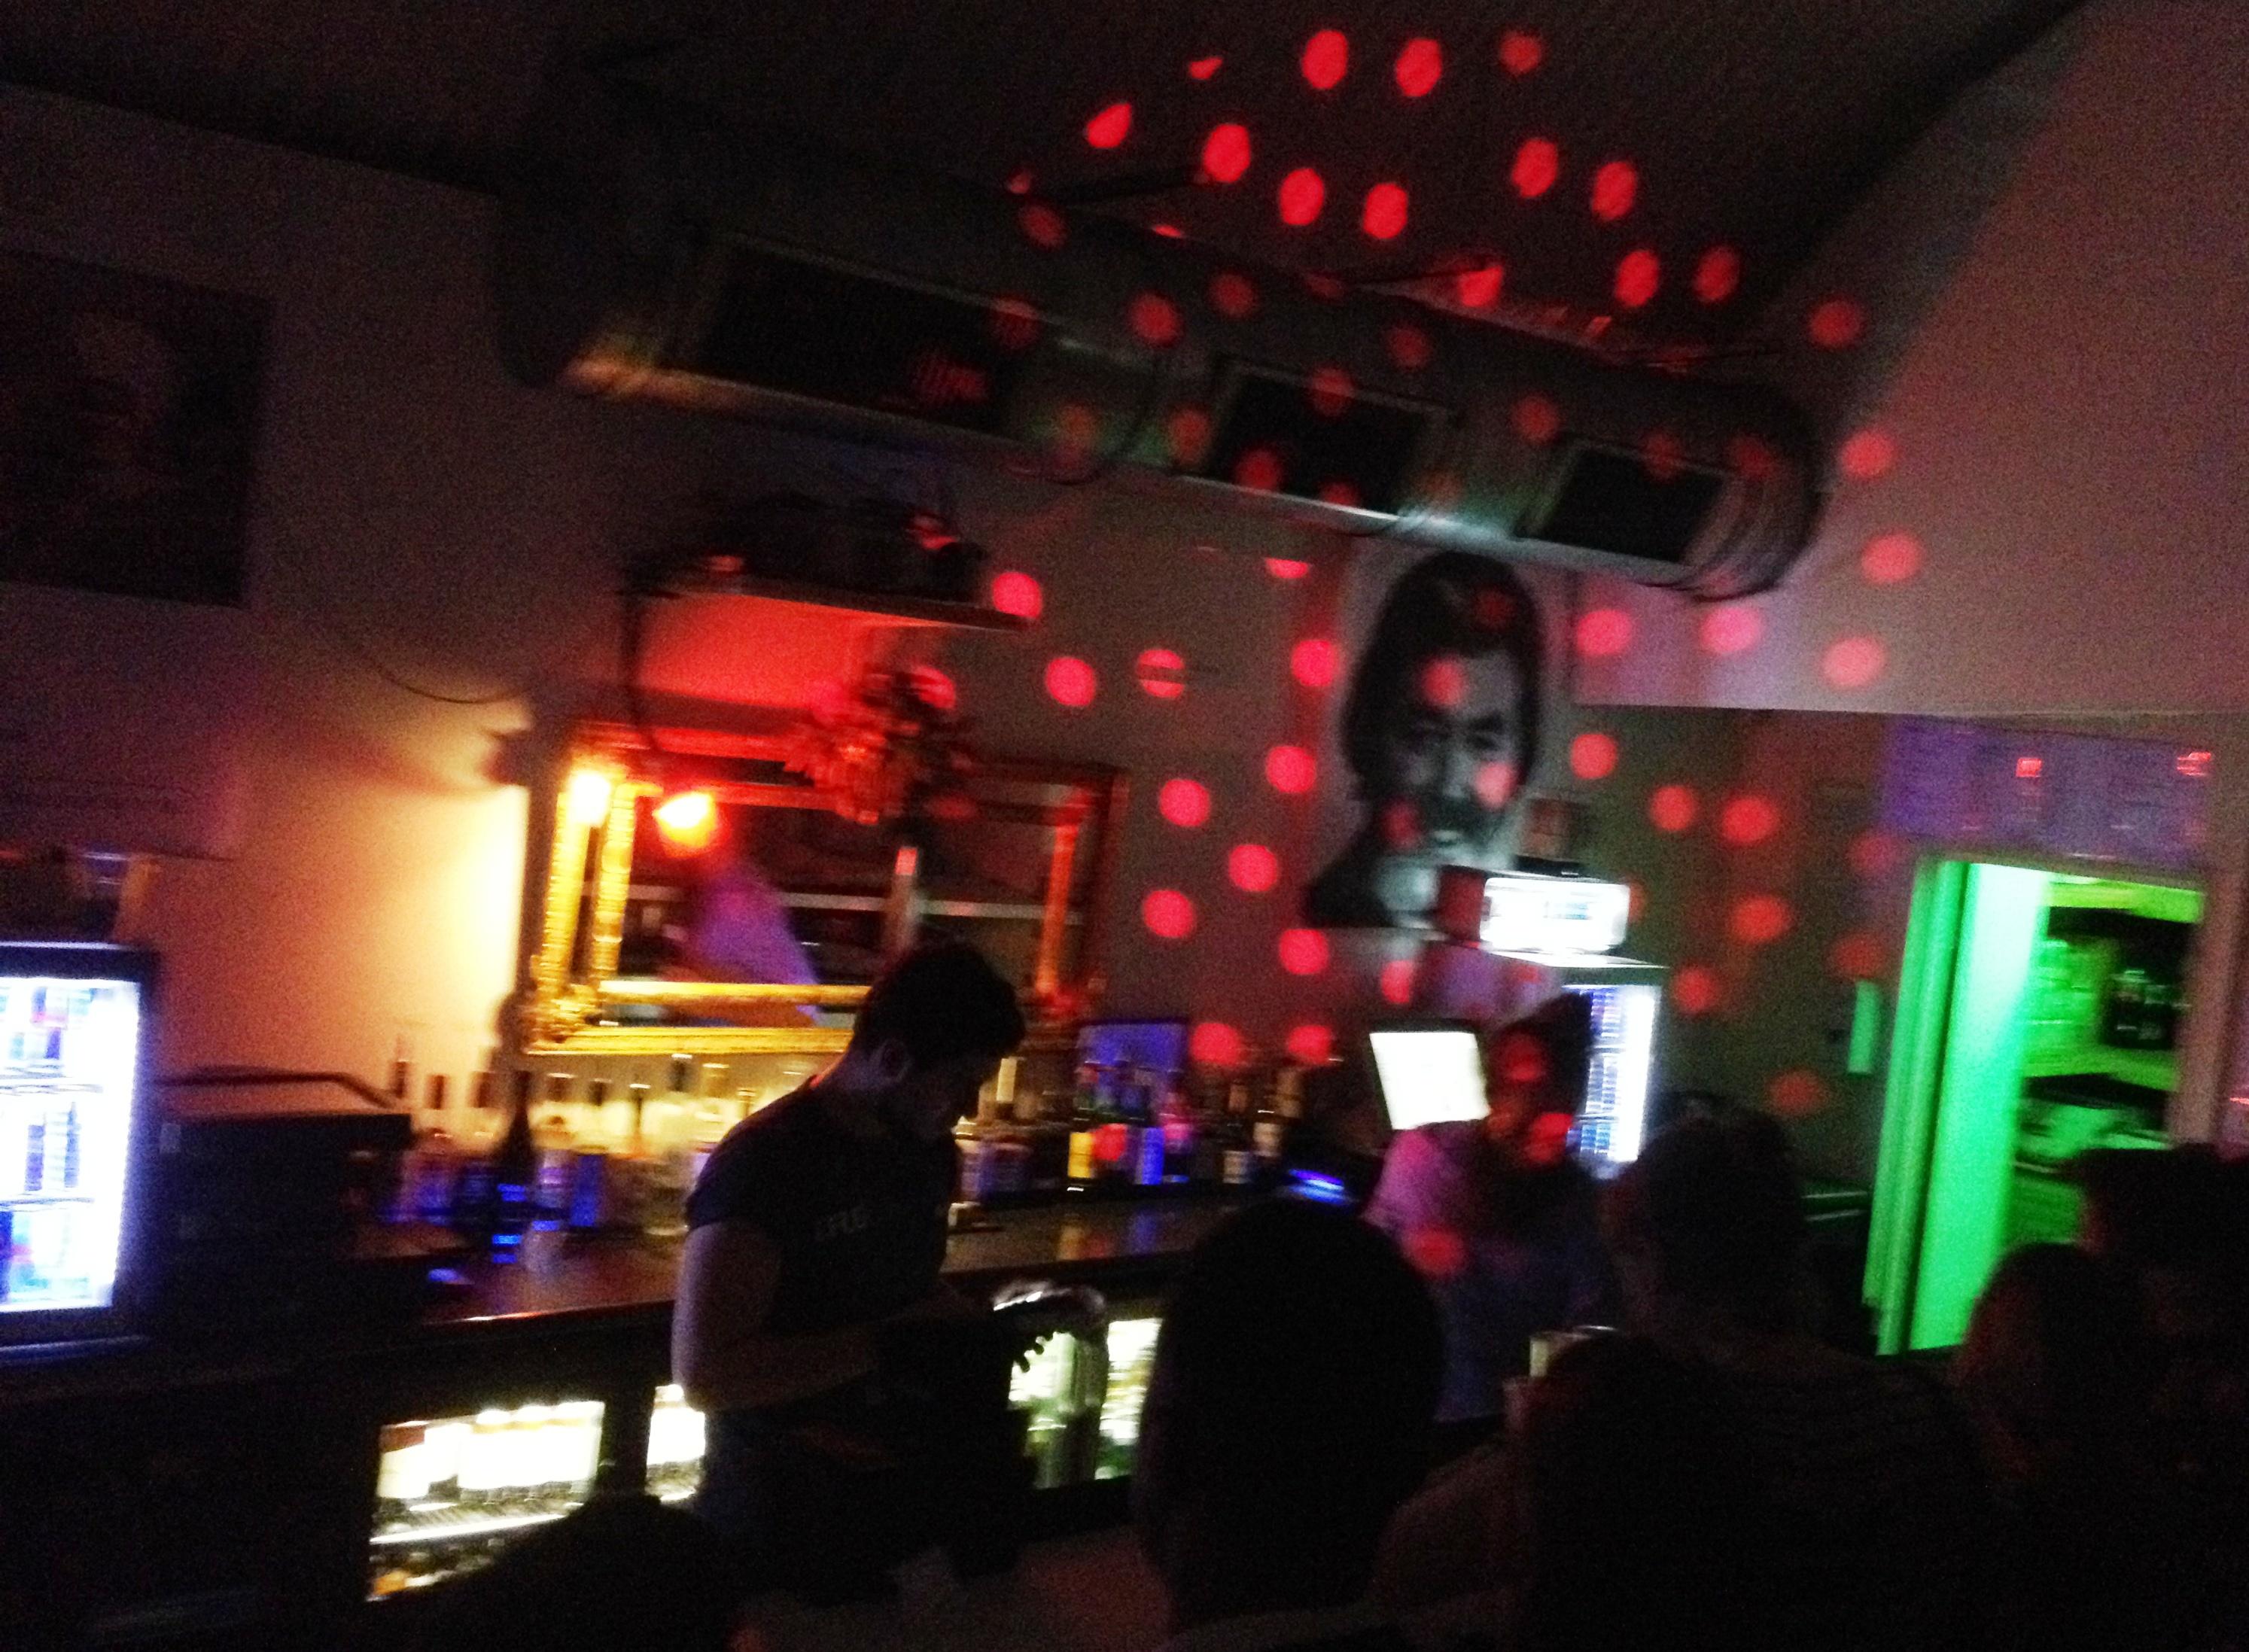 Corsica Studios bar - kenningtonrunoff.com